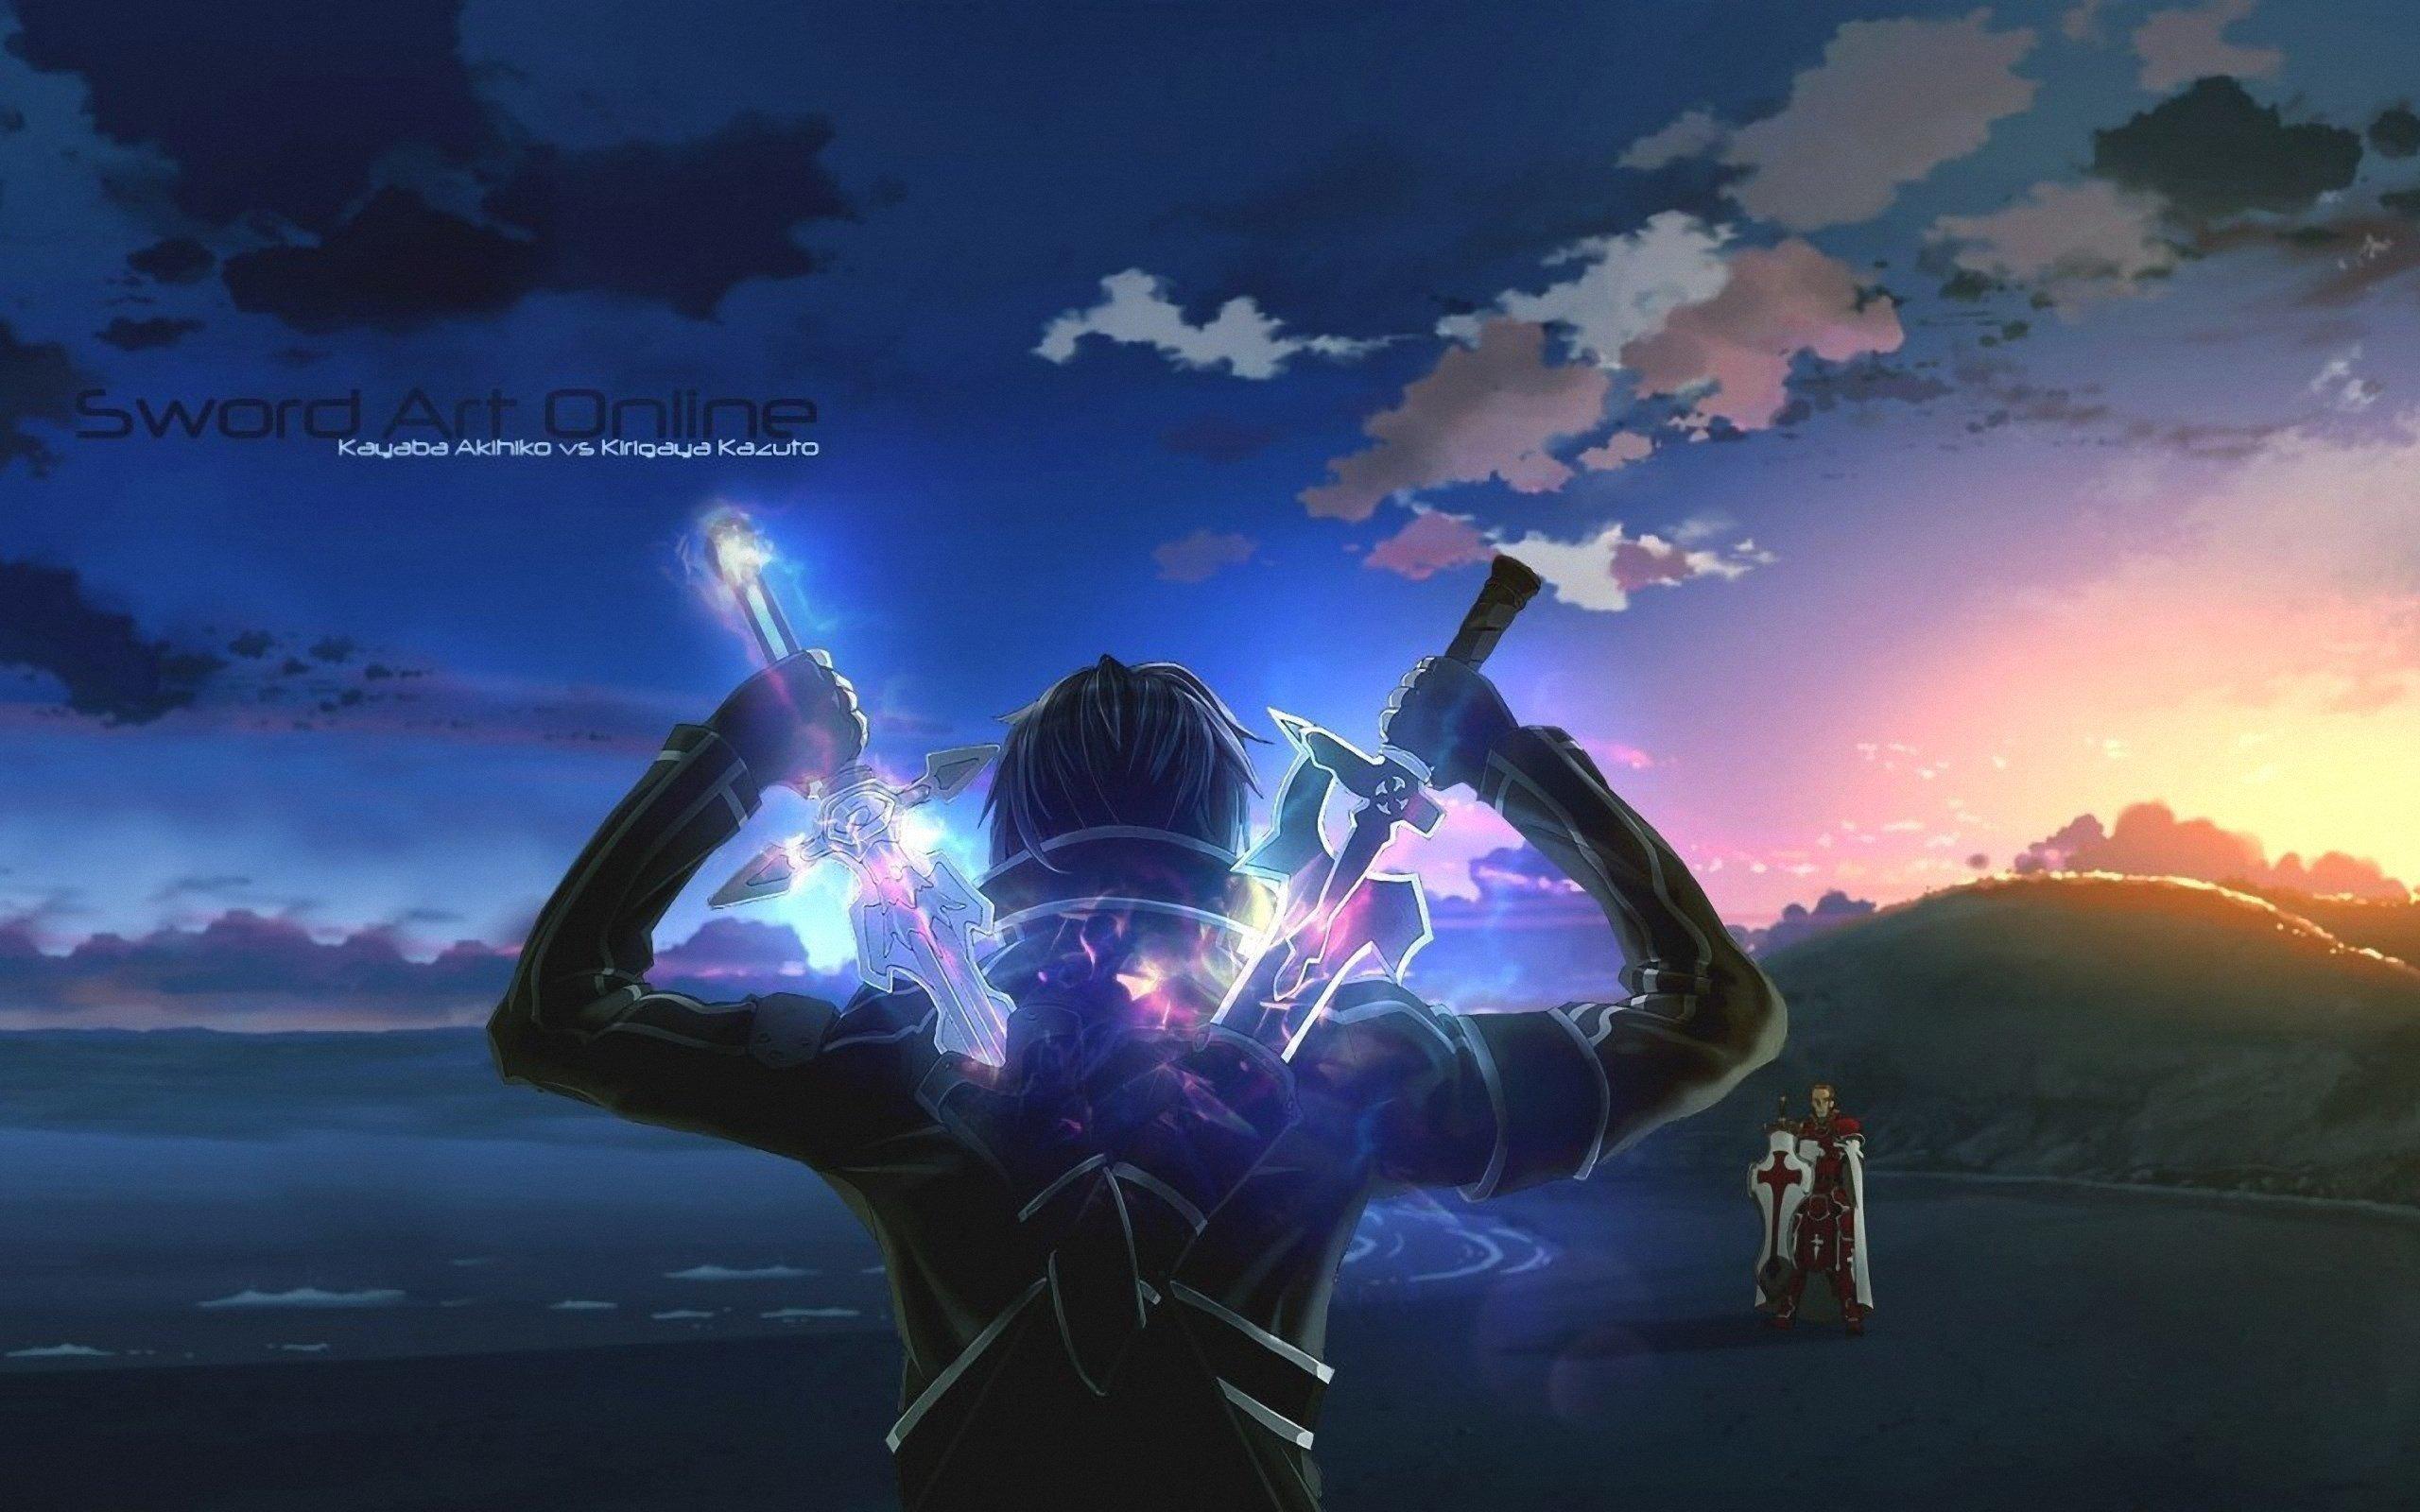 Epic Anime Wallpapers HD - WallpaperSafari